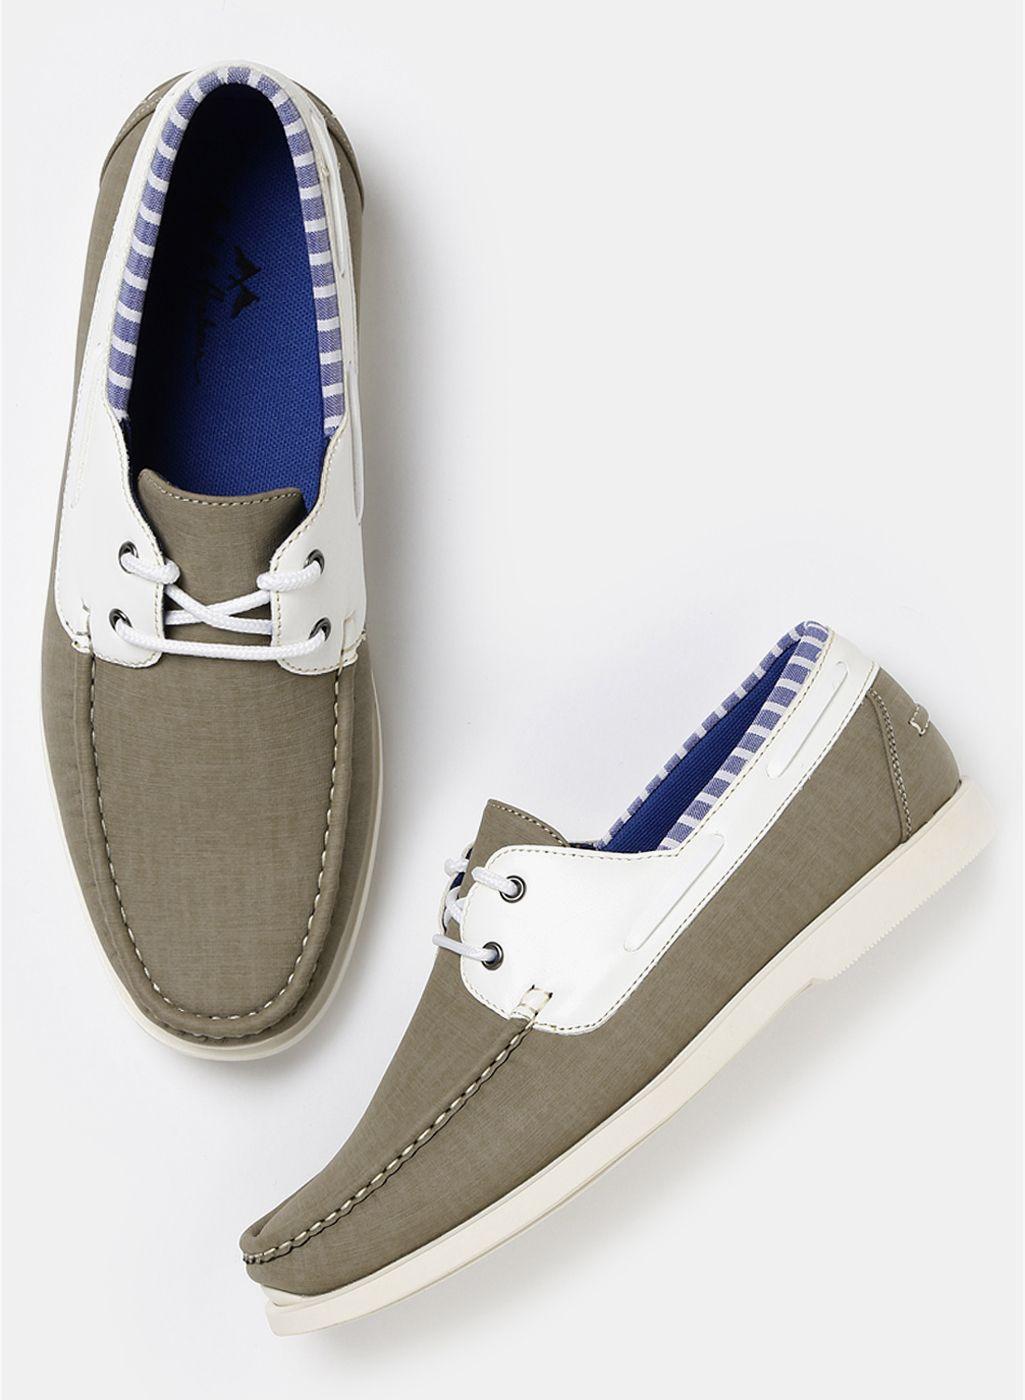 Mast & Harbour #Olive #BoatShoes #CasualFootwear #MenFashion